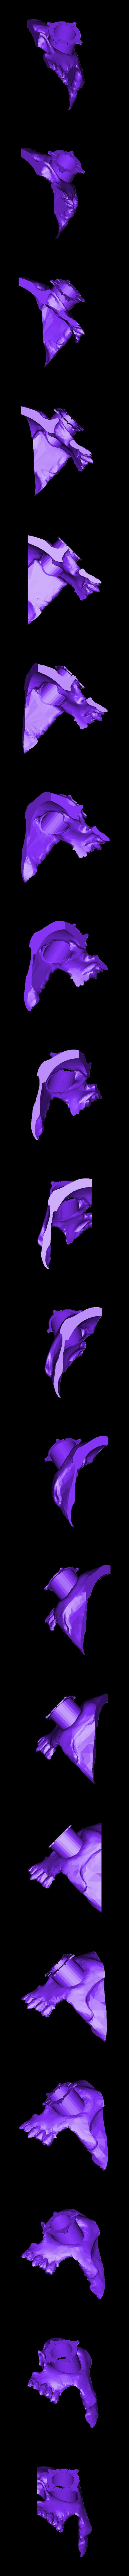 skull_main_V2_iris_goggles_repaired_Cut_2_Cut_1.stl Download free STL file Steampunk Skull helmet V2 • 3D printer design, cube606592